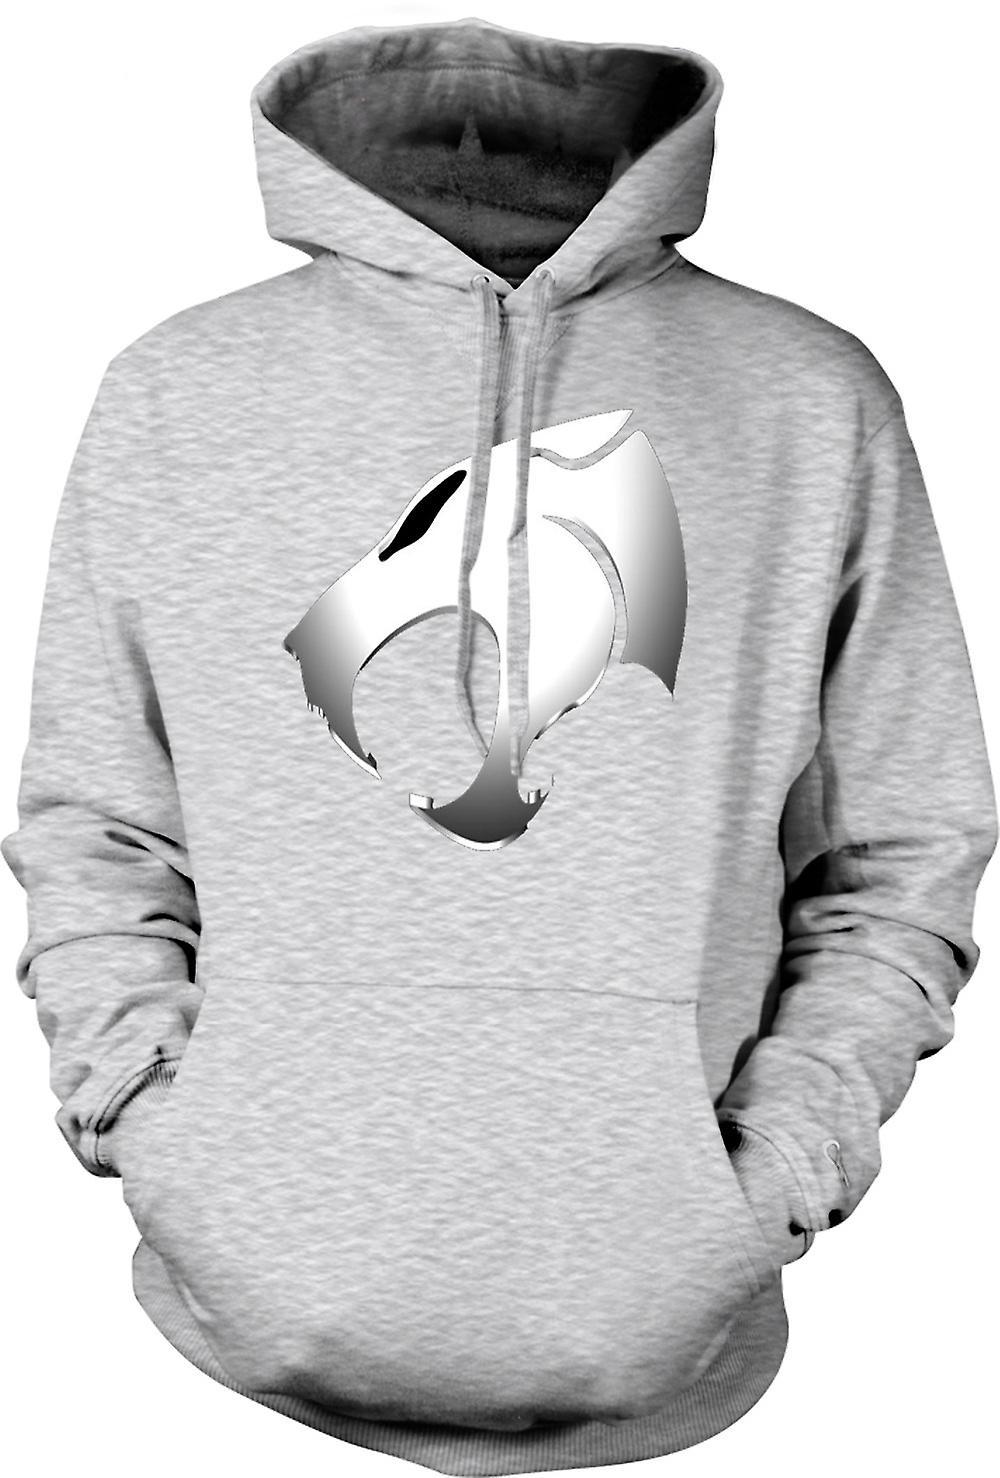 Herren Hoodie - Thundercats - Metallic Logo